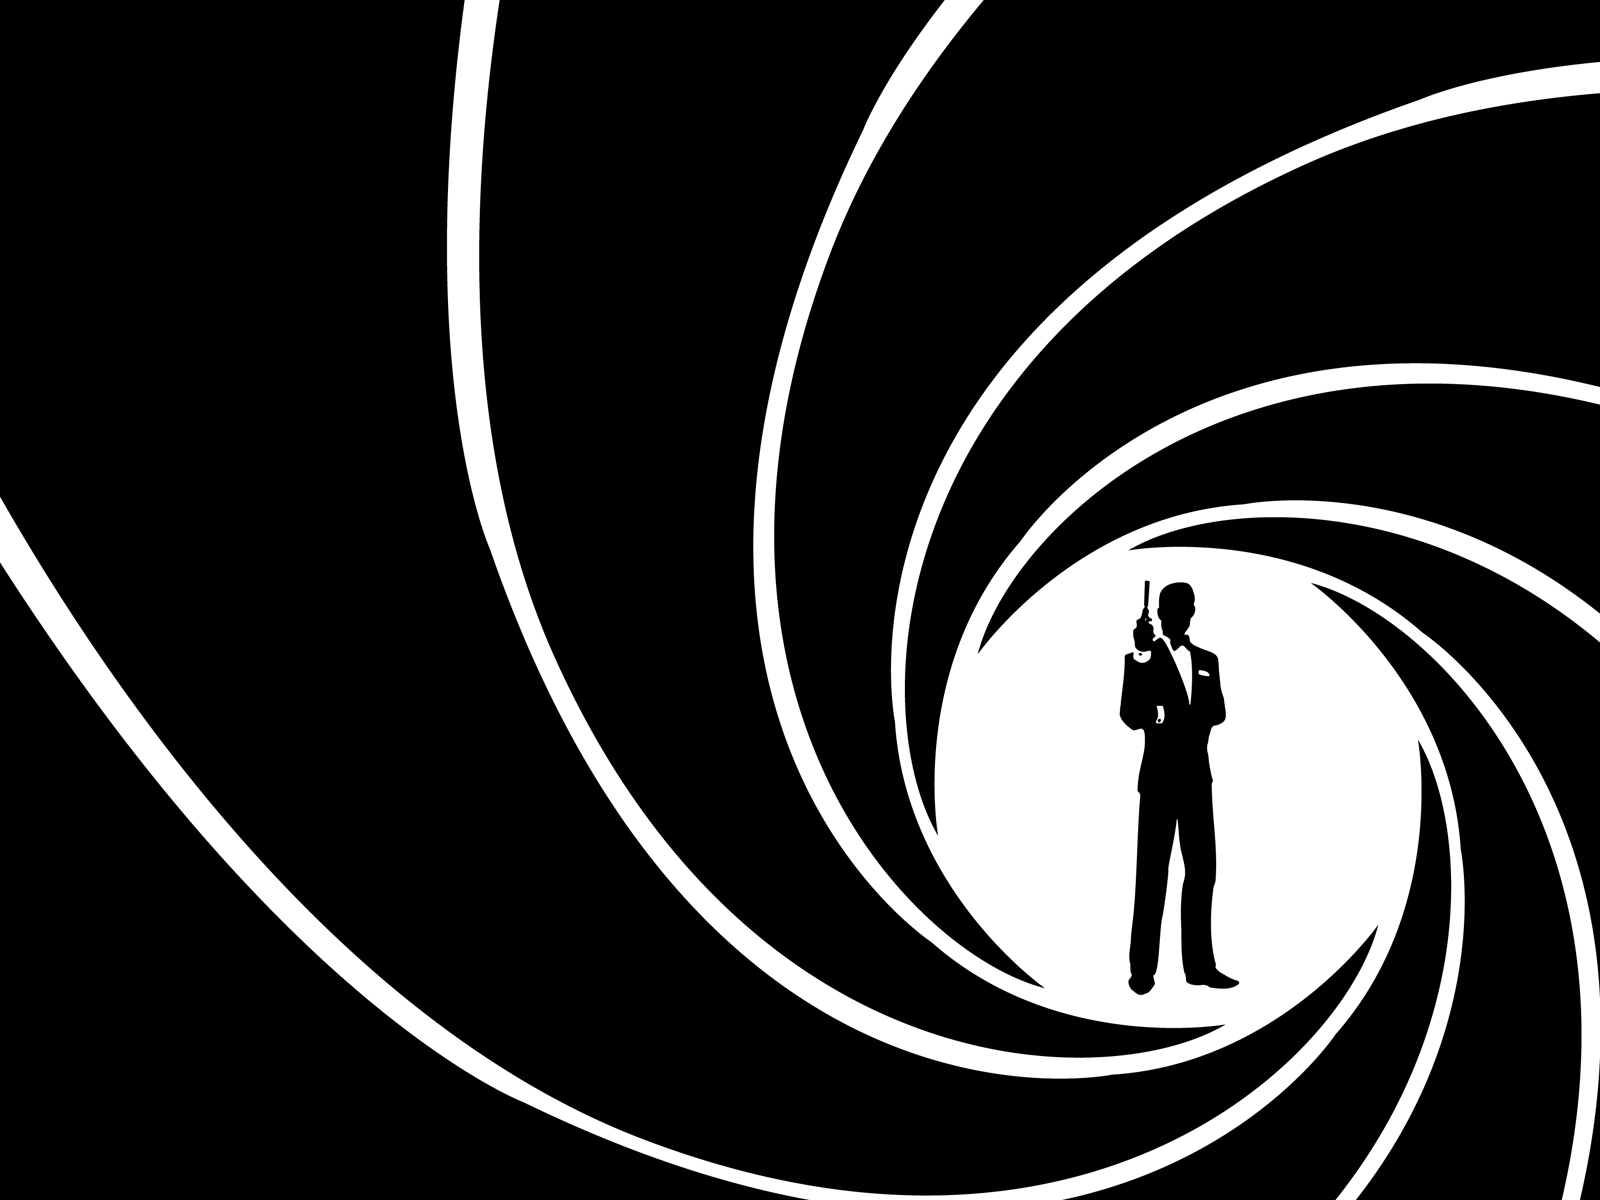 Skyfall new james bond theme best bond themes censored bond music